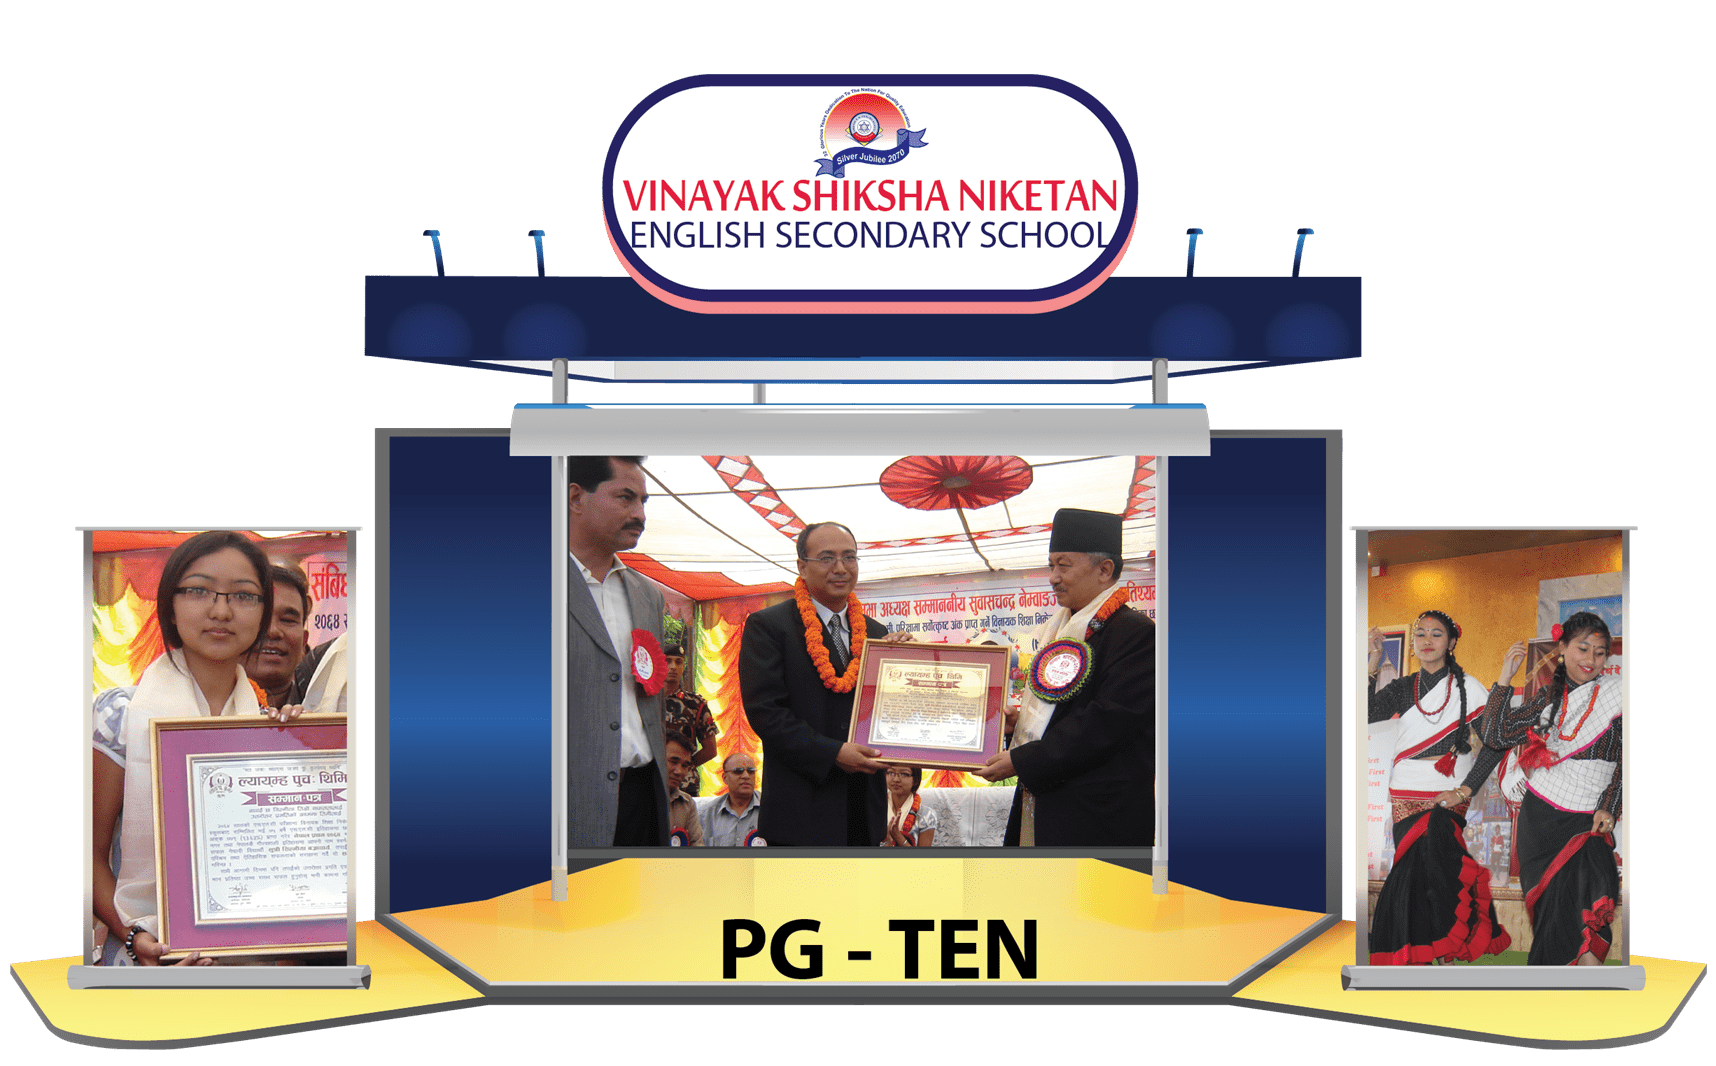 Vinayak Shiksha Niketan English Secondary School